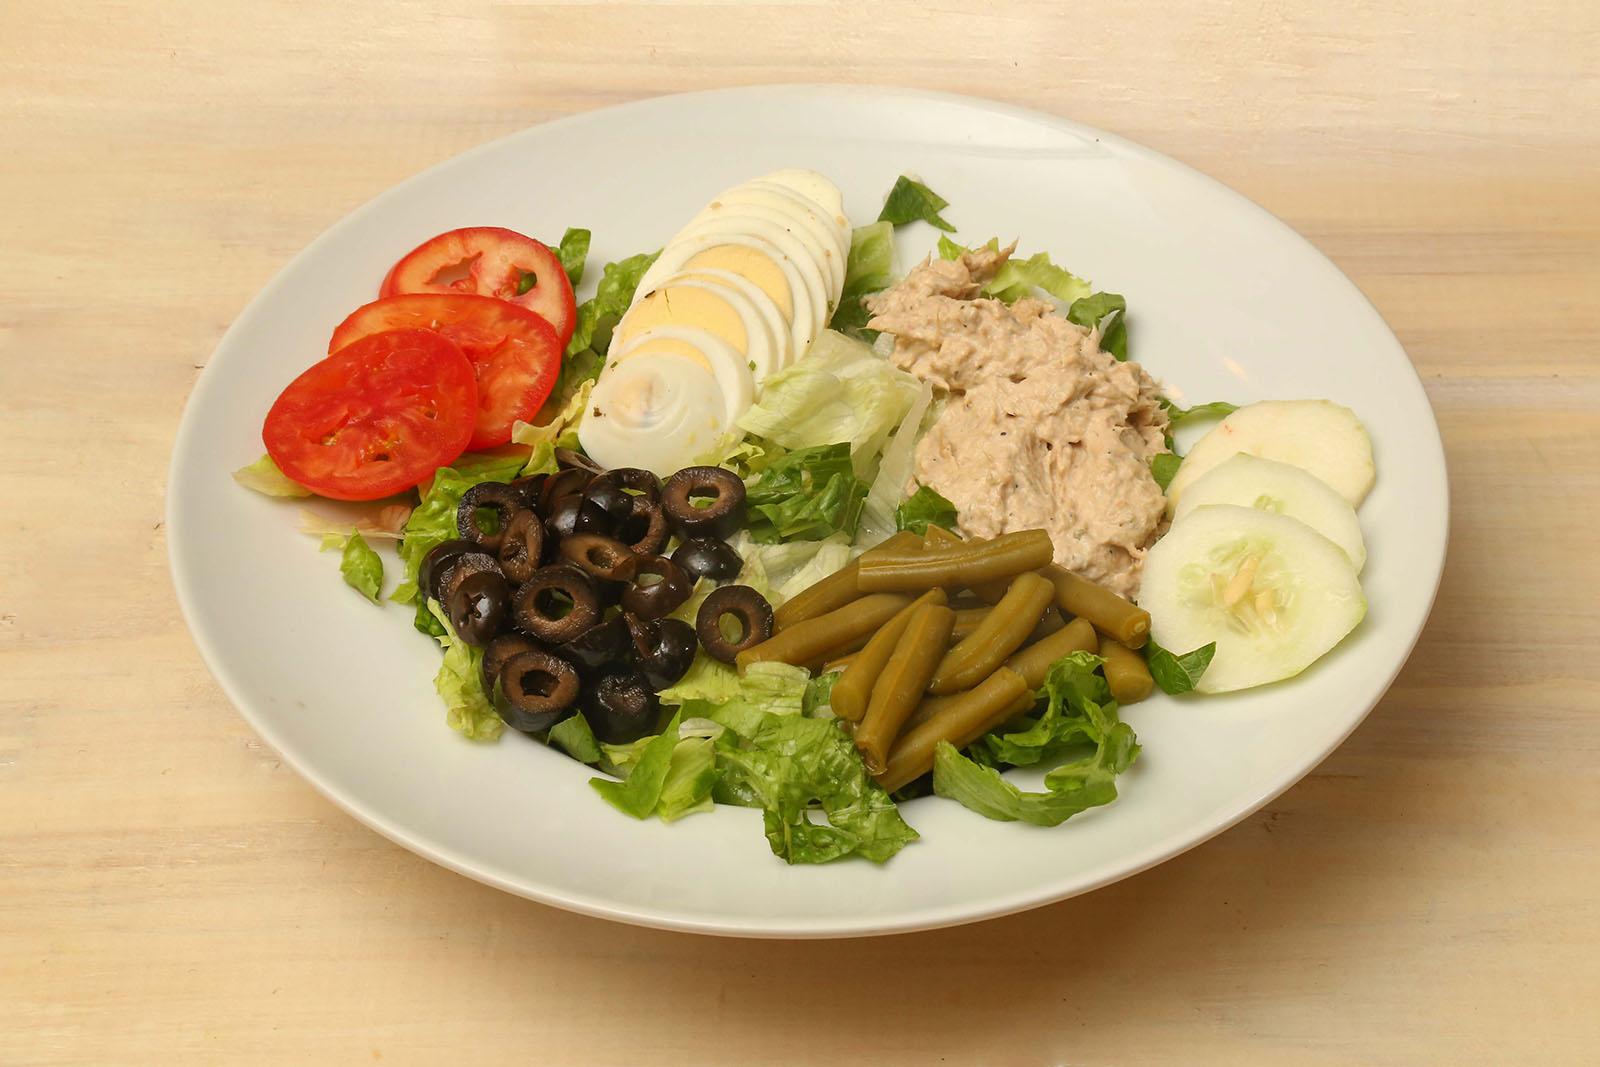 Salade nicoise with tuna